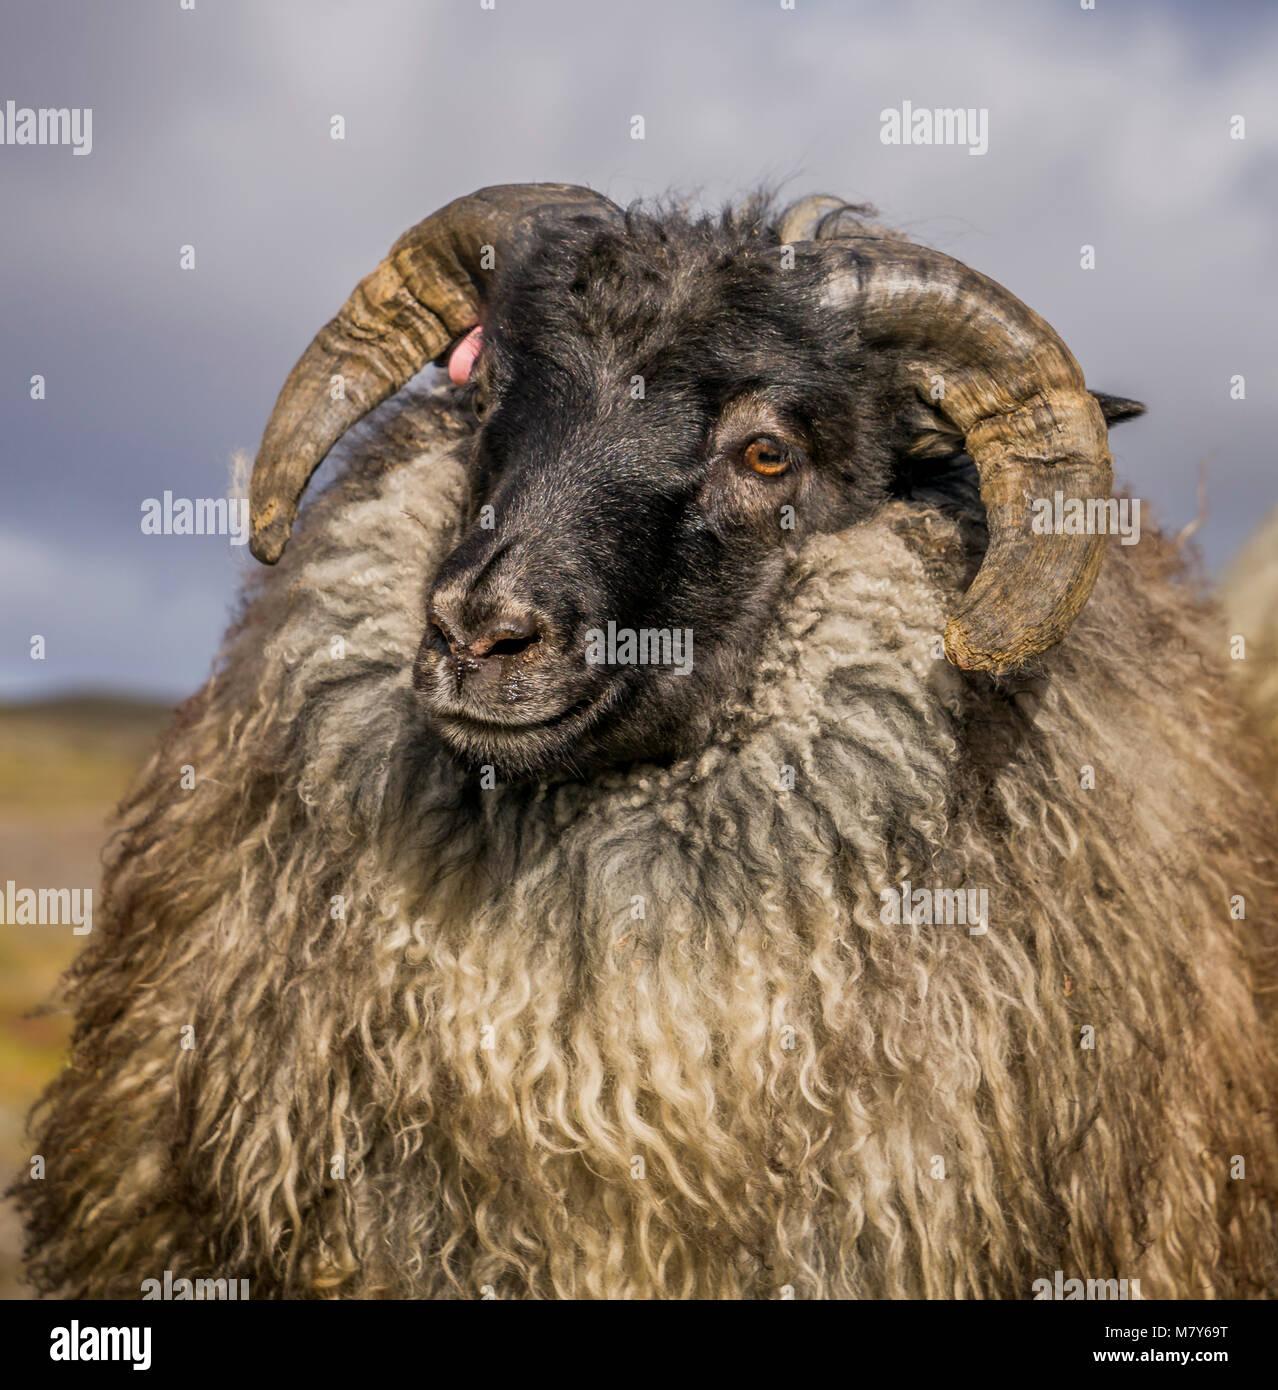 Ovejas Negras islandés, Otoño round-up, Islandia Imagen De Stock